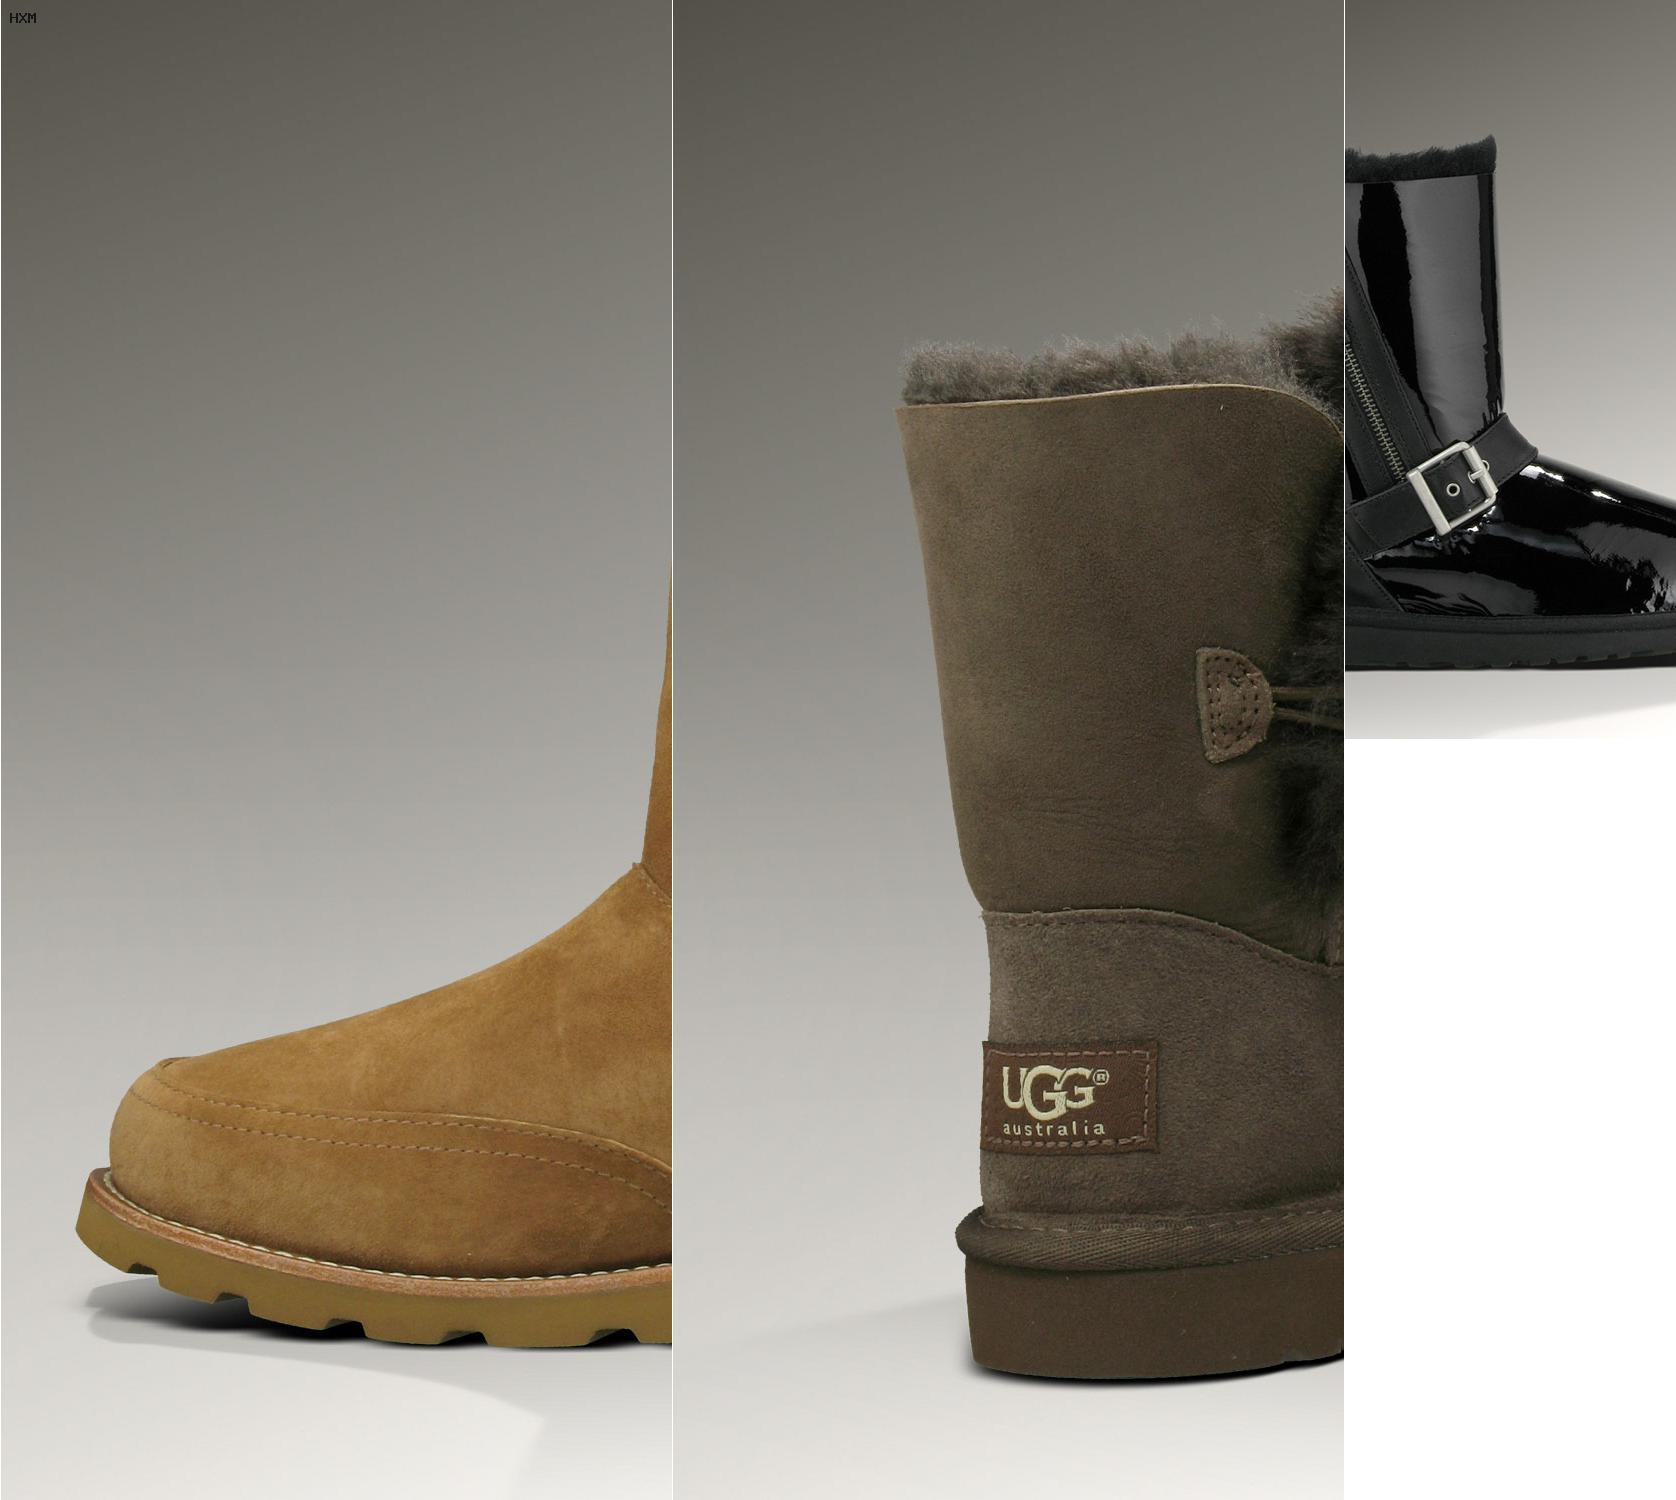 comprar botas ugg mujer